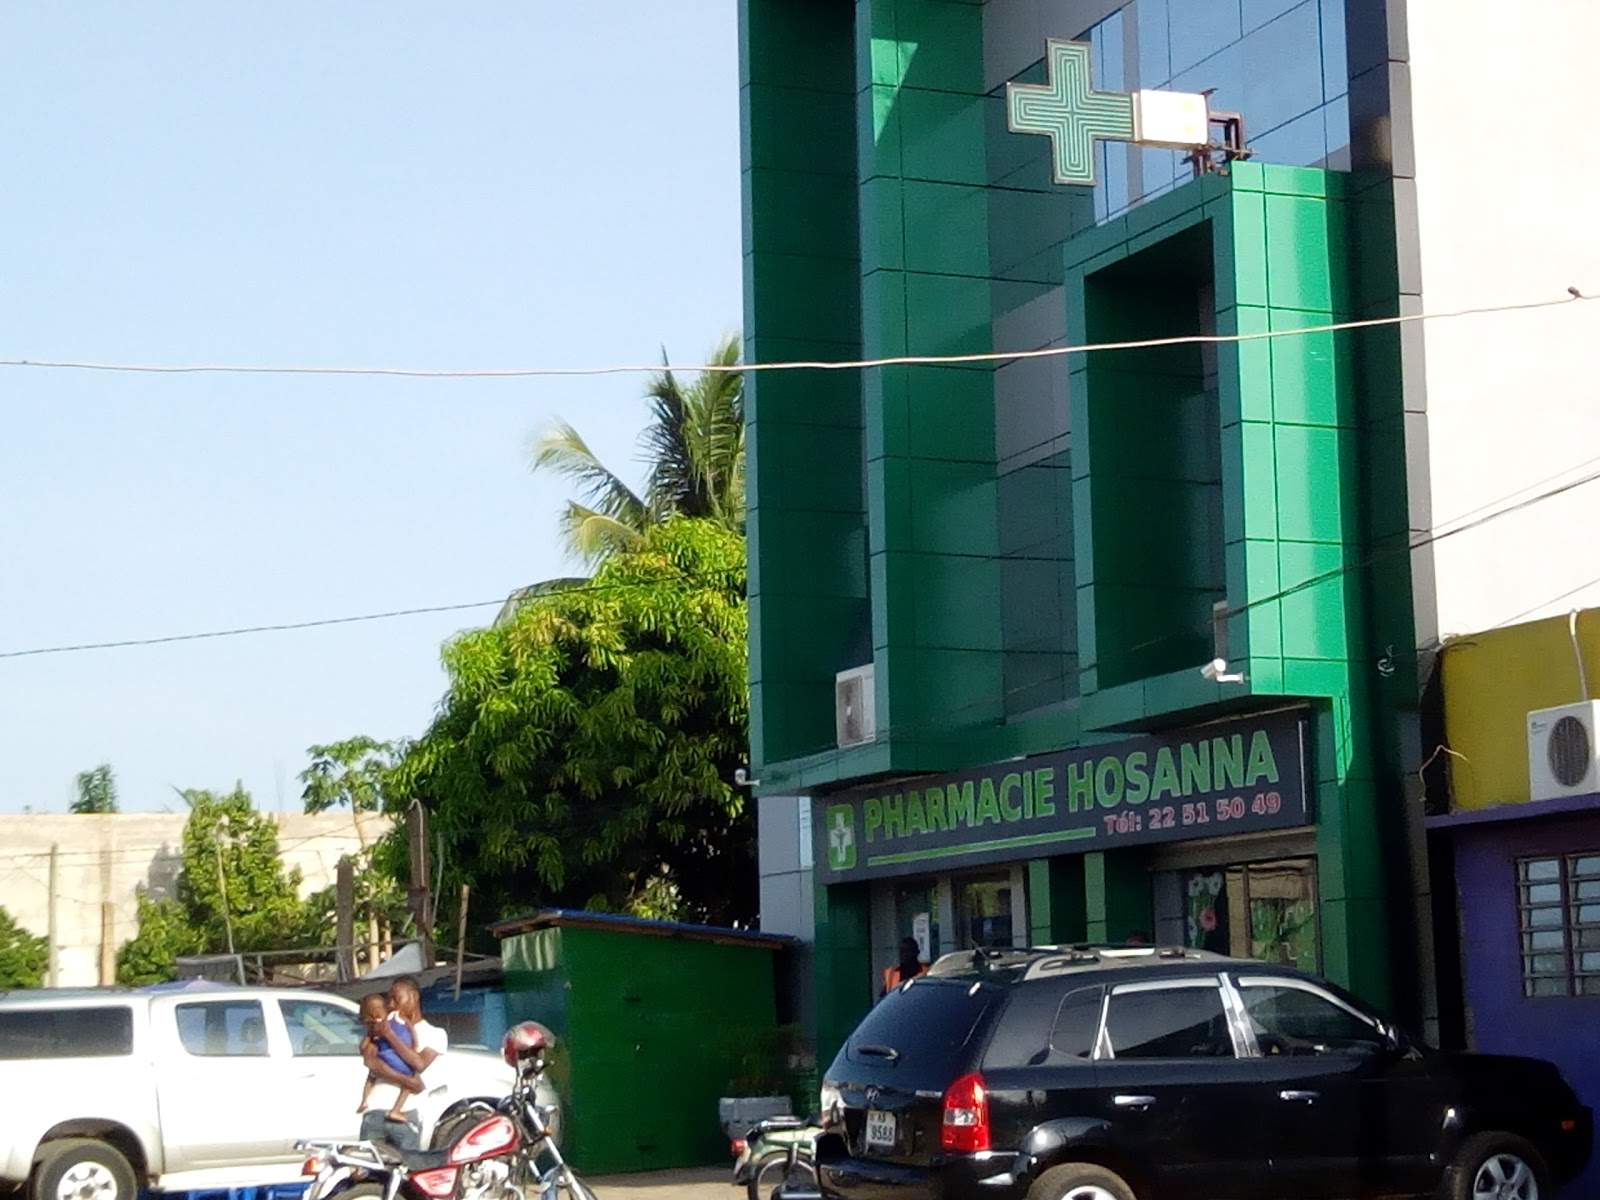 Pharmacie Hosanna